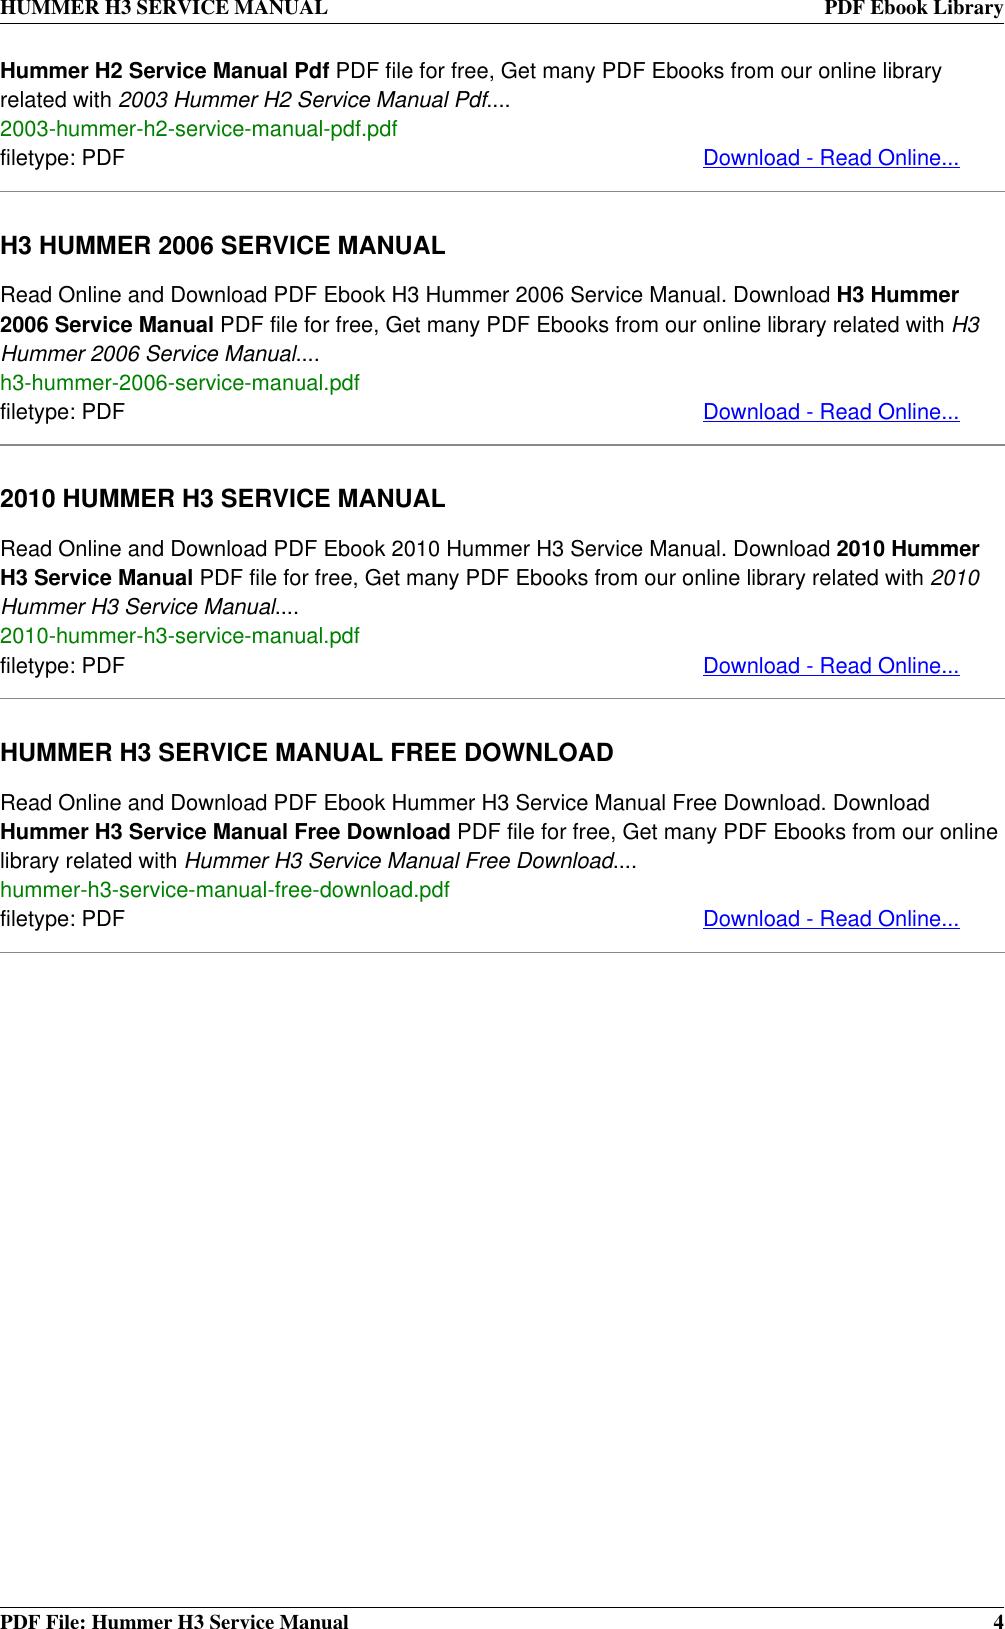 Cheap humvee user guide user manuals array cheap humvee user guide user manuals rh cheap humvee user guide user manuals leshielo fandeluxe Gallery